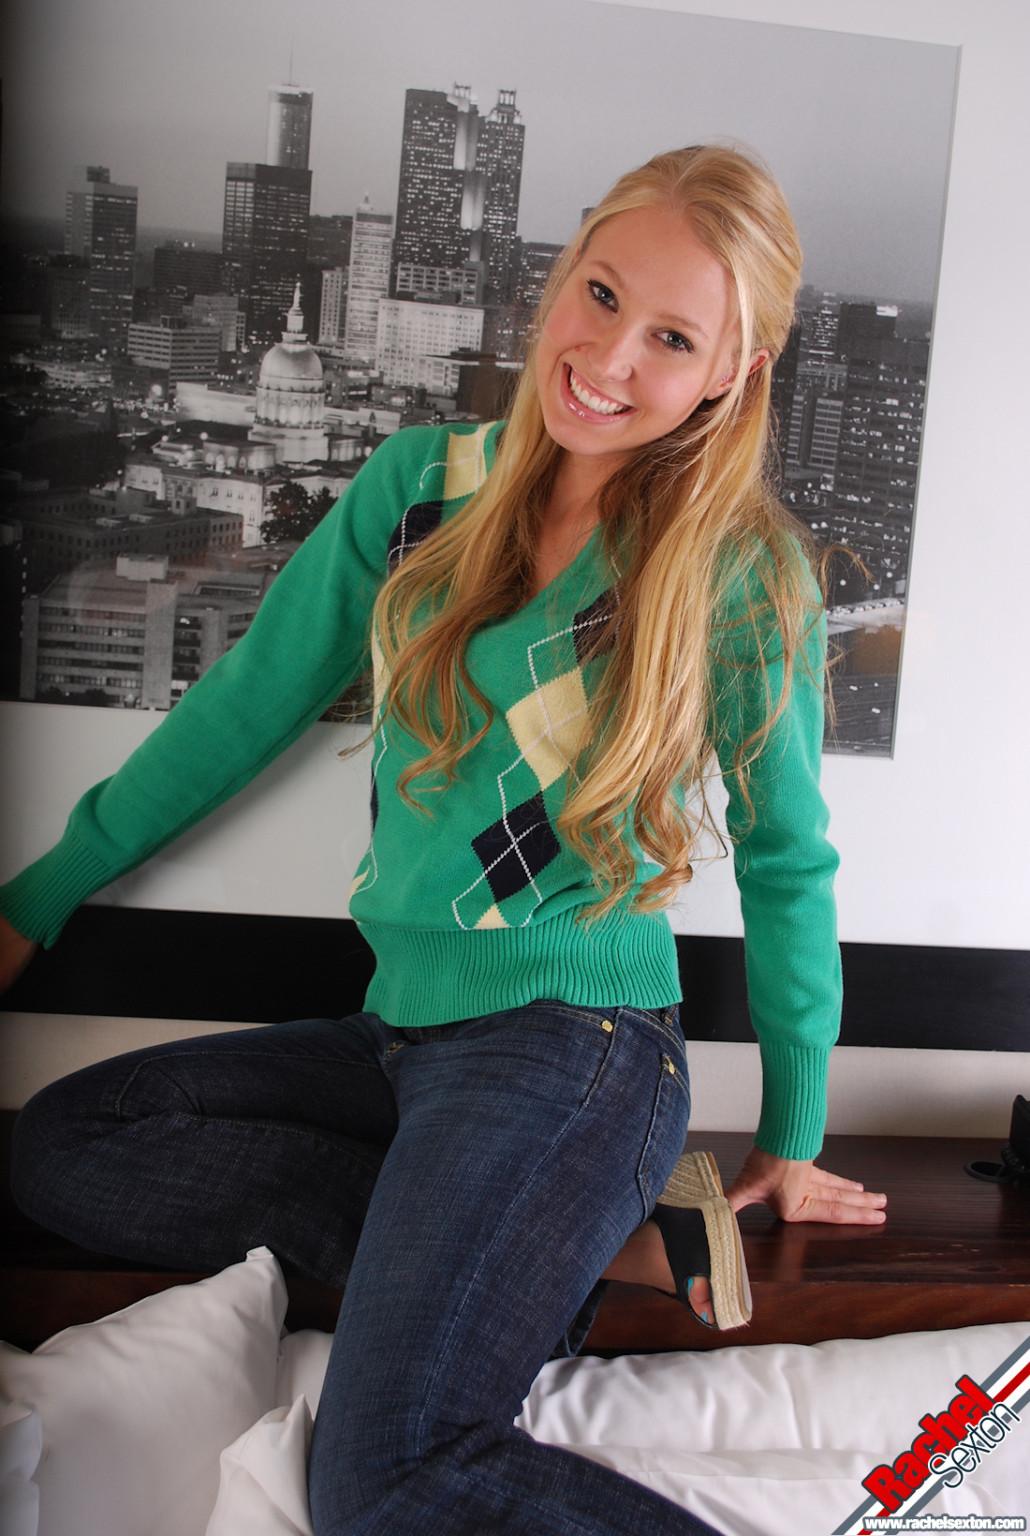 Rachel sexton in her everyday street dress